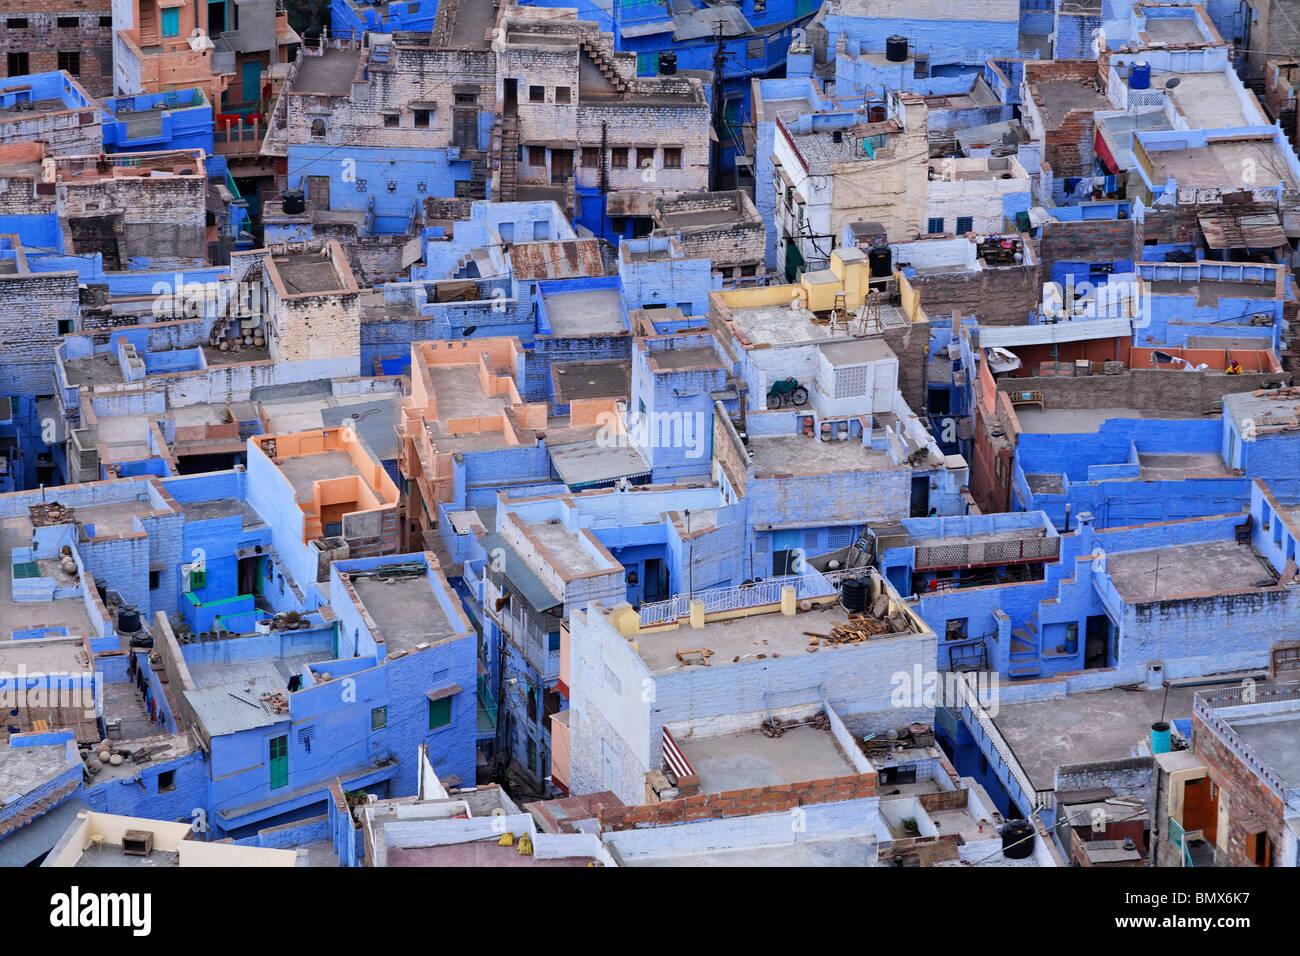 La ciudad azul de Jodhpur, Rajasthan, India Foto de stock